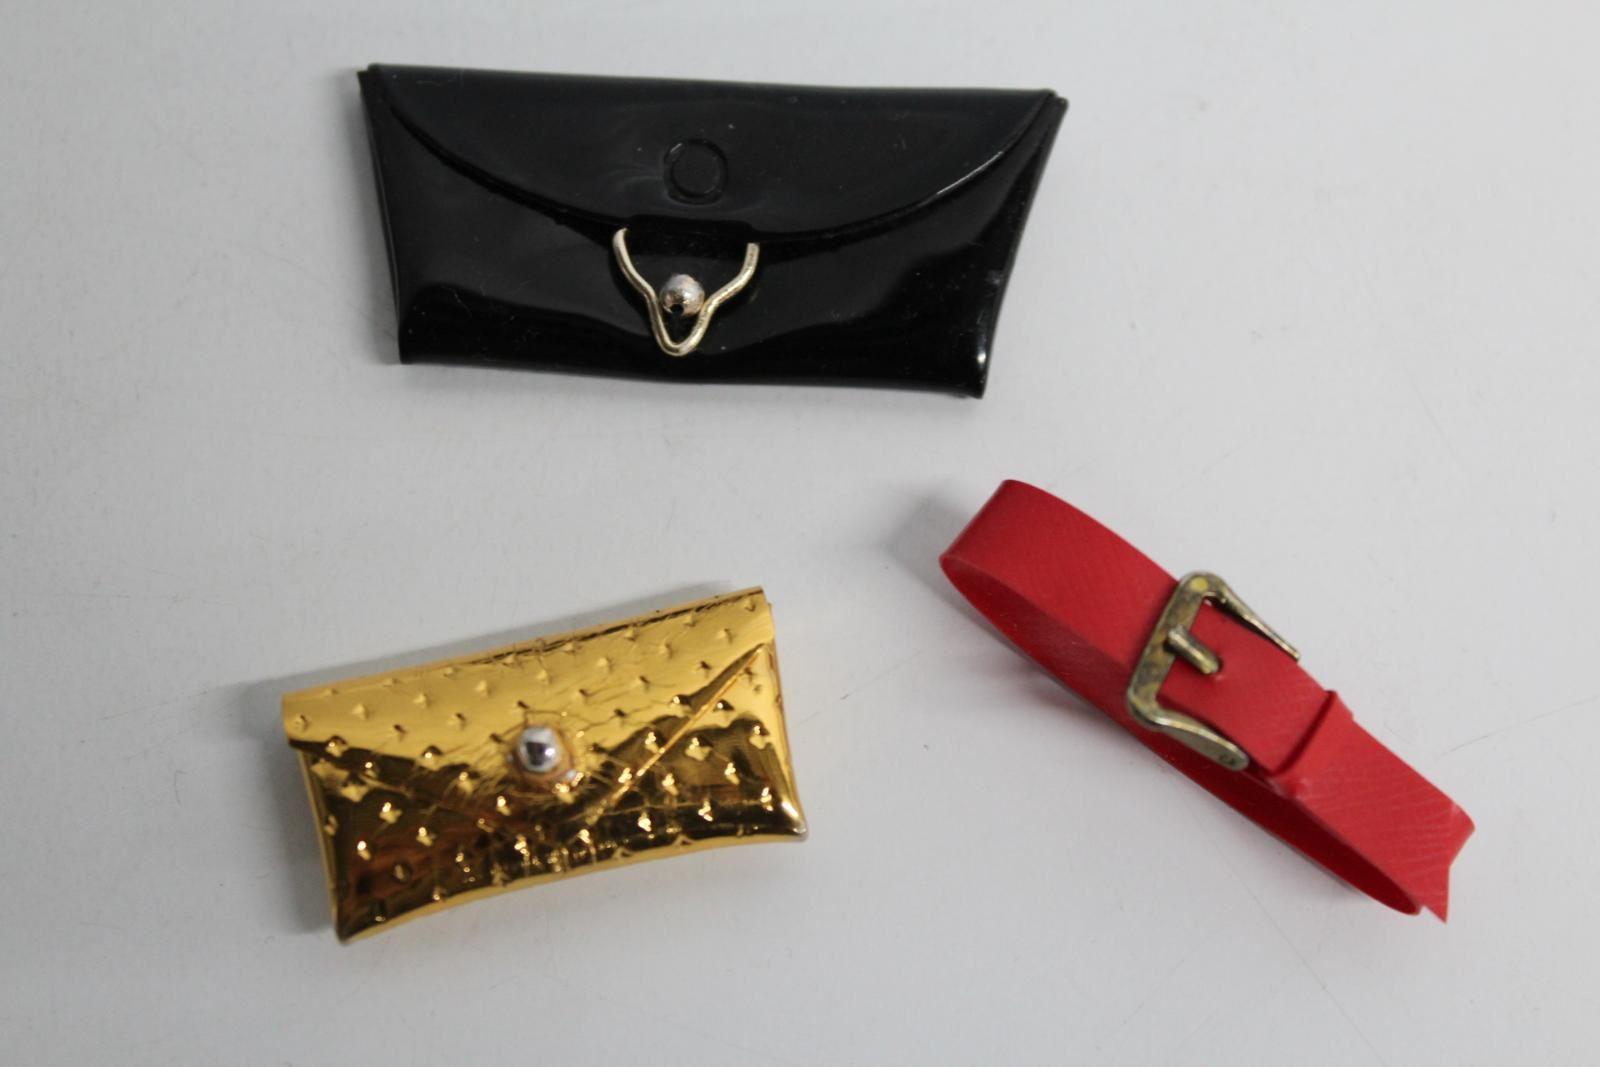 Vintage-Barbie-Gold-Dimple-Clutch-Black-Purse-amp-Red-Belt-Doll-Accessory-Lot